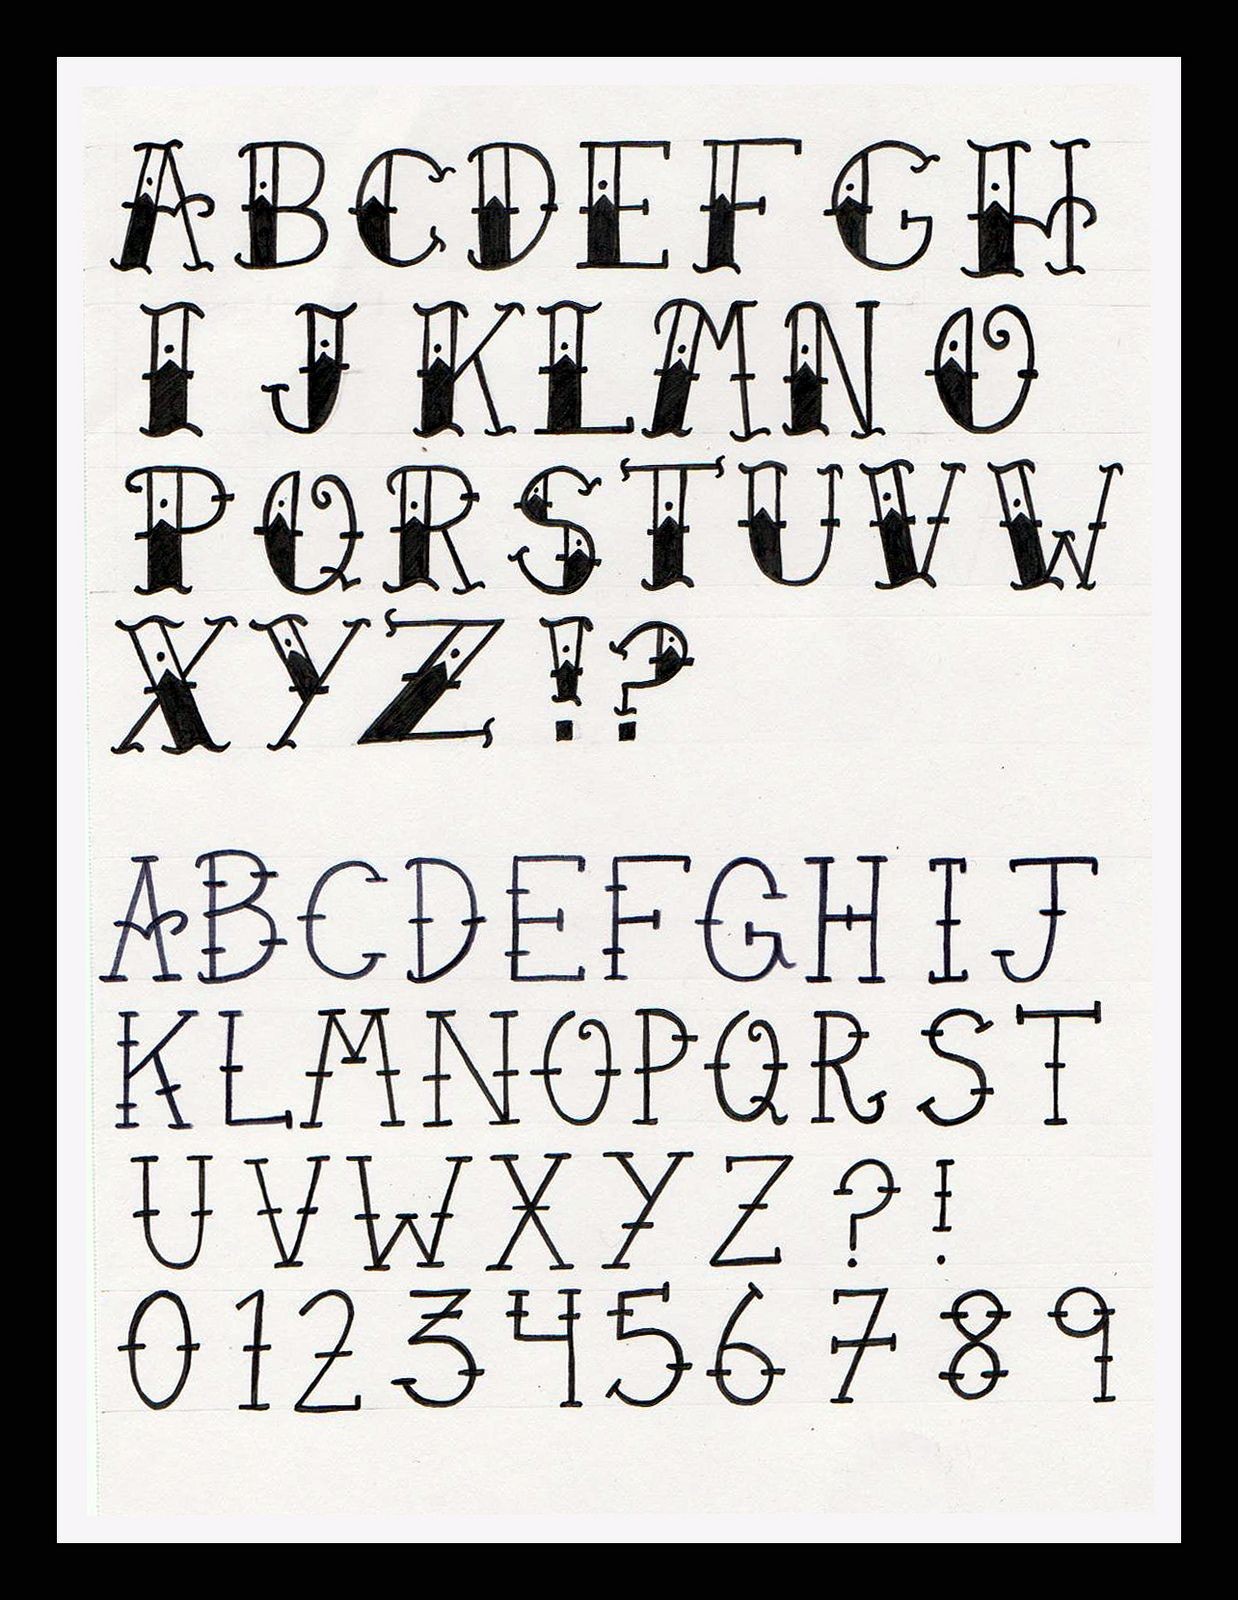 Old School Tattoo Alphabet Tattoo alphabet, Lettering